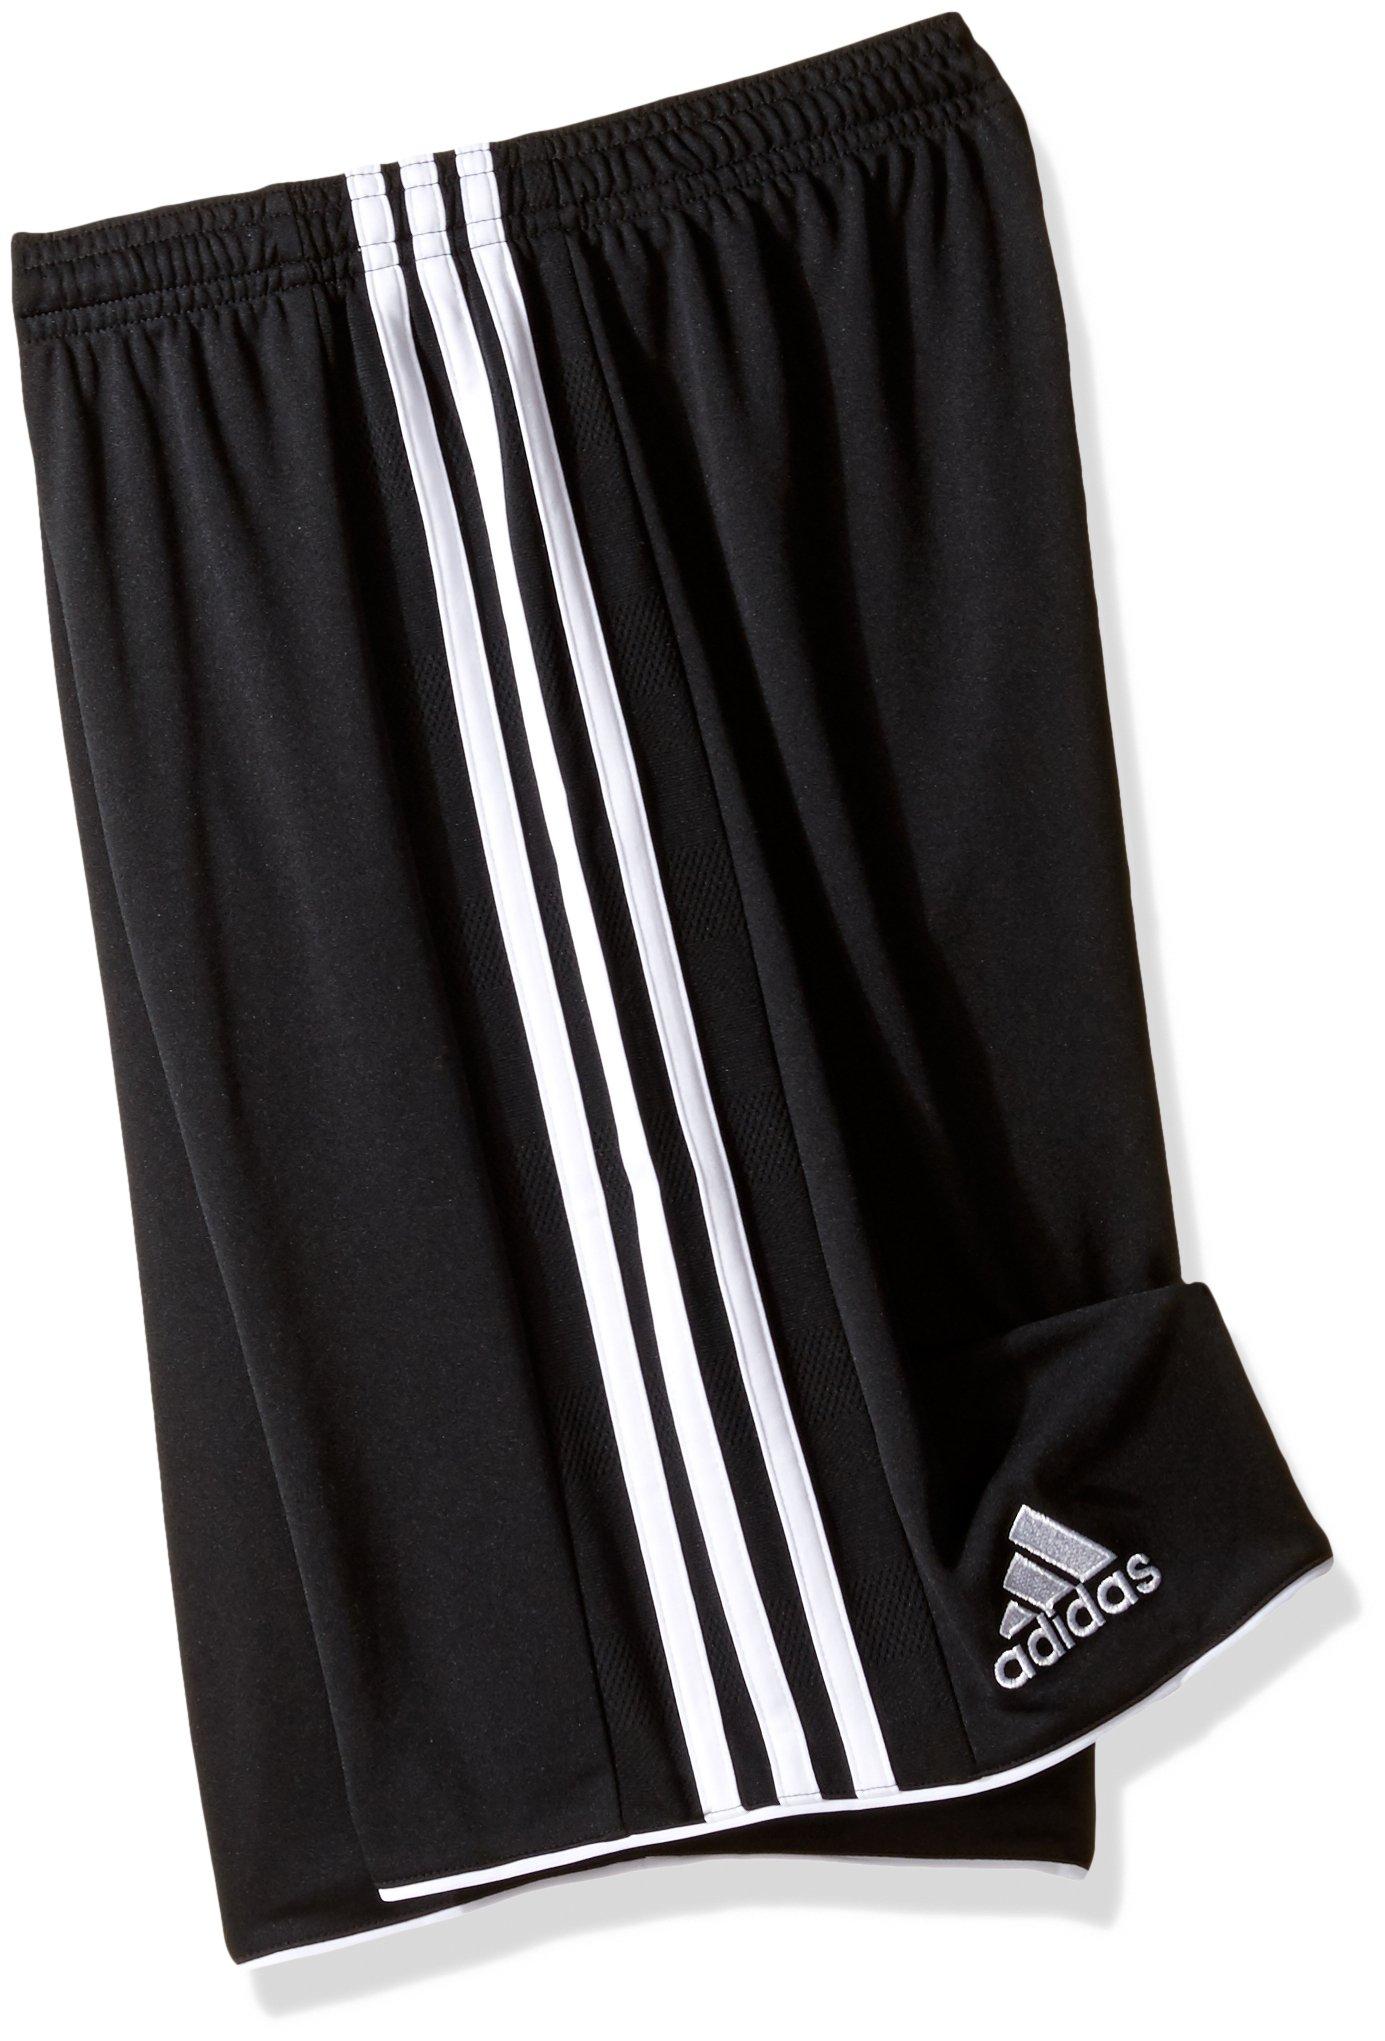 dcfb098cf36 adidas Youth Soccer Tastigo 17 Shorts